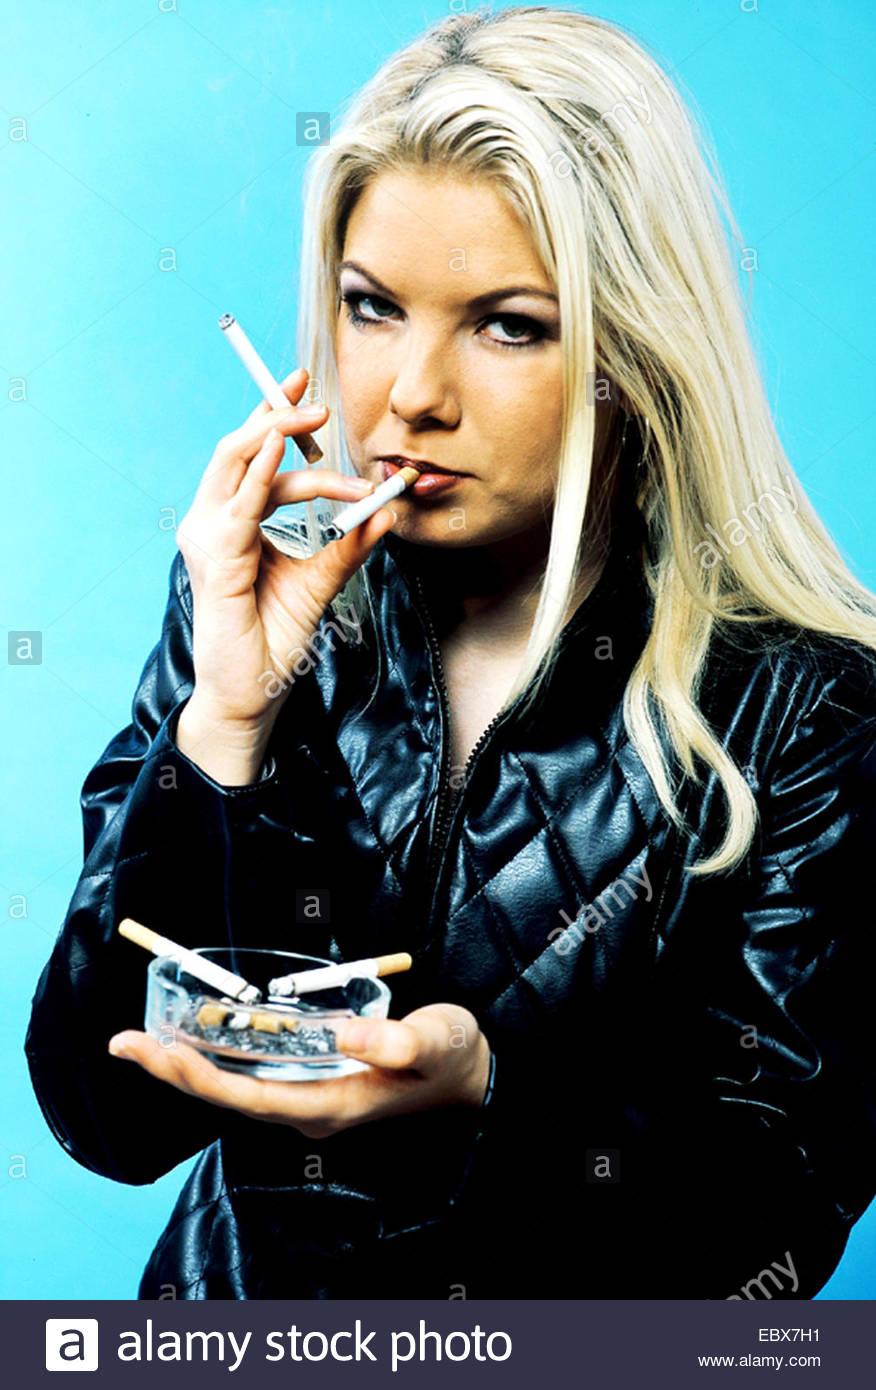 Chain Smoker Stock Photos & Chain Smoker Stock Images - Alamy